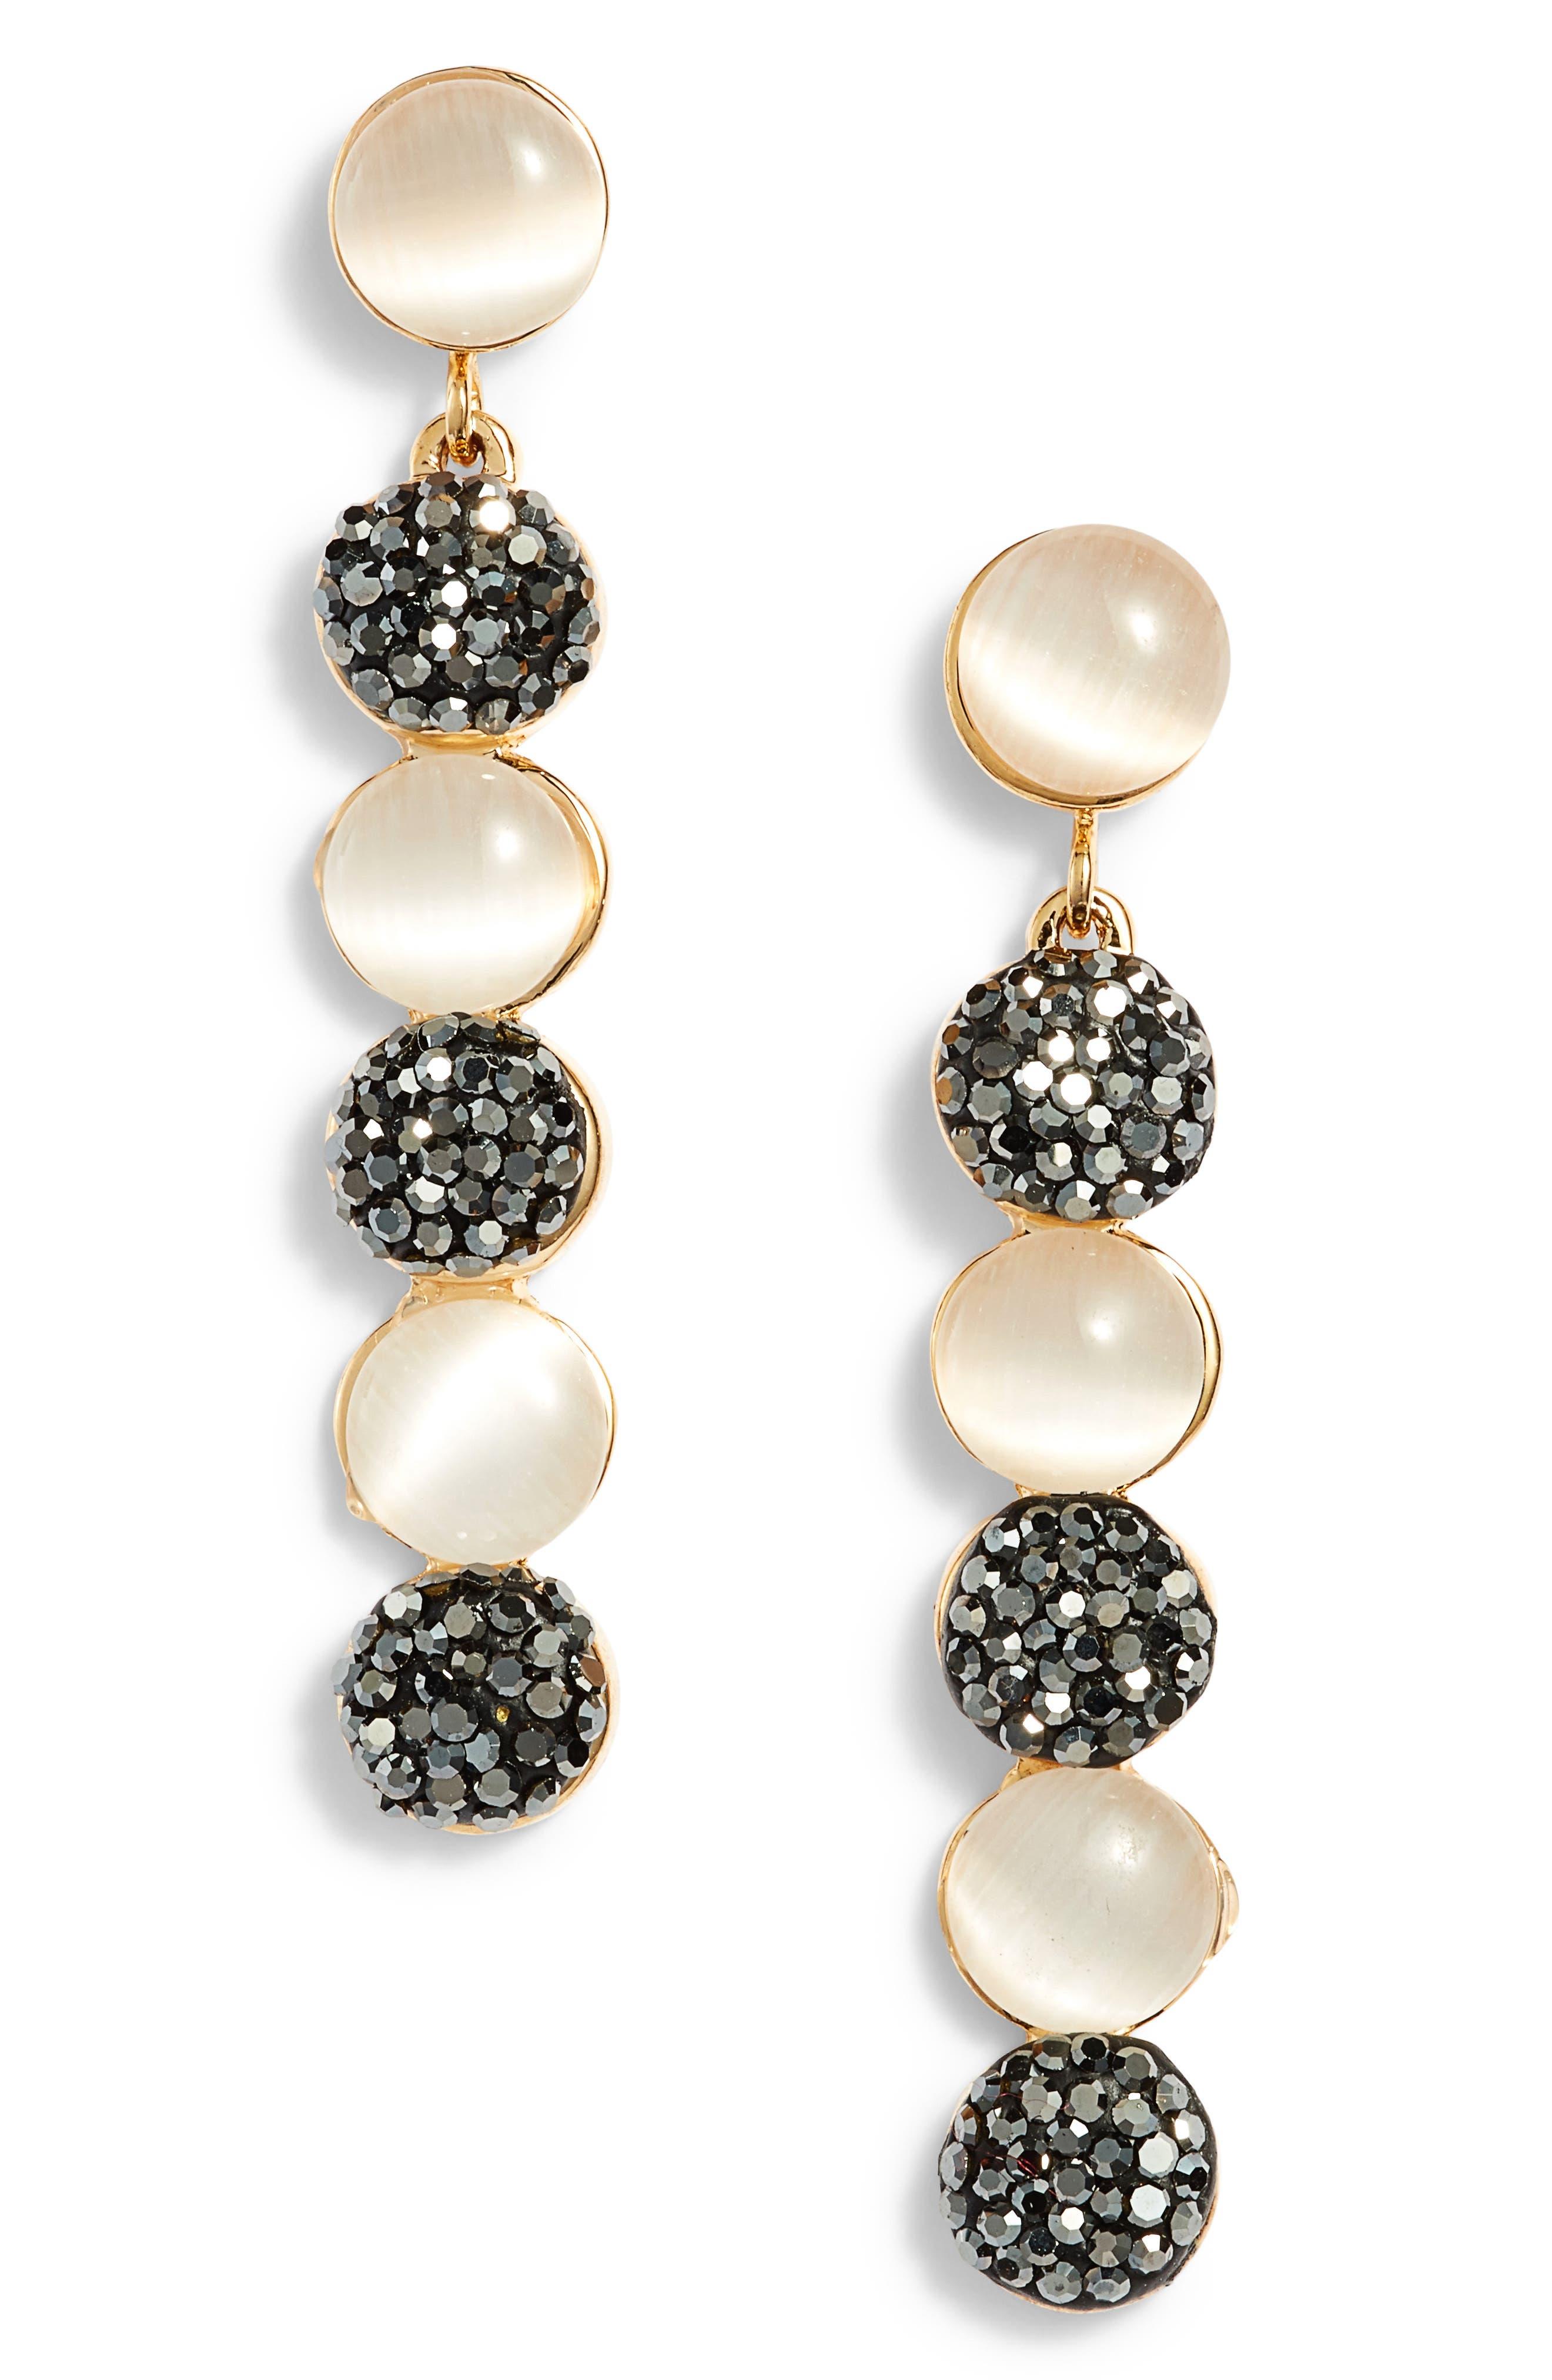 Elise M. Alaise Moonstone Statement Earrings